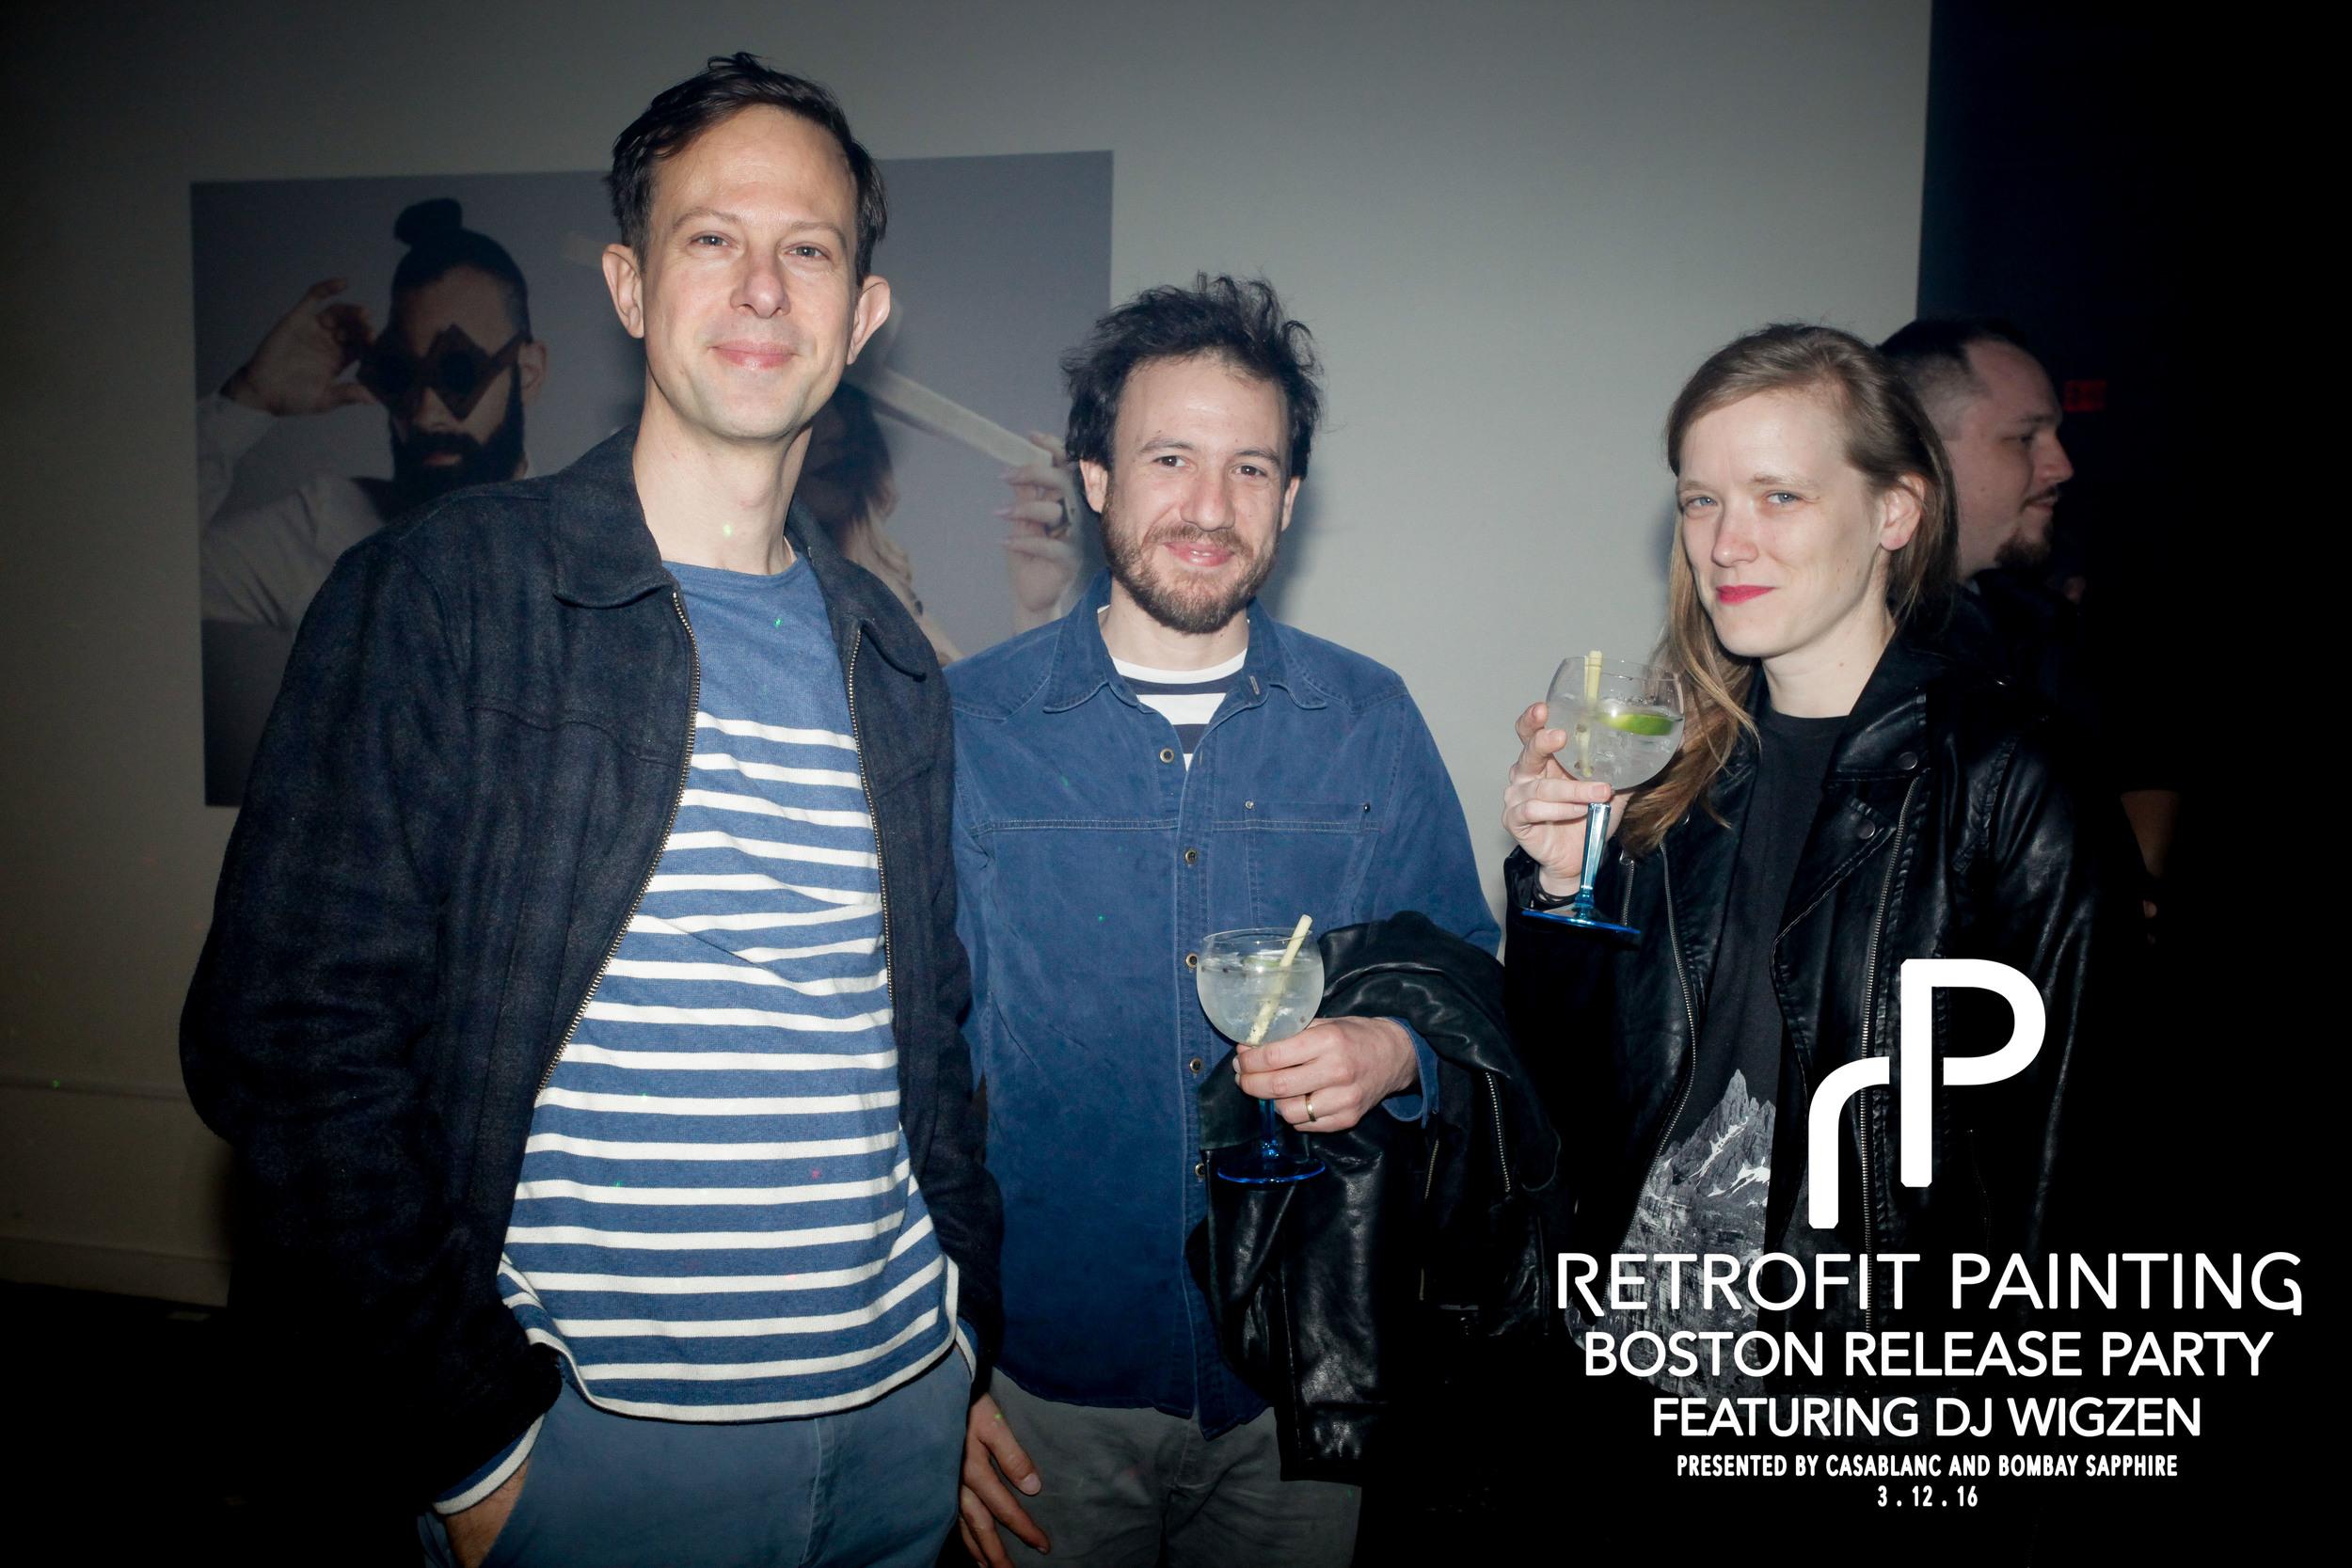 Retrofit Painting Boston Release Party 0043.jpg